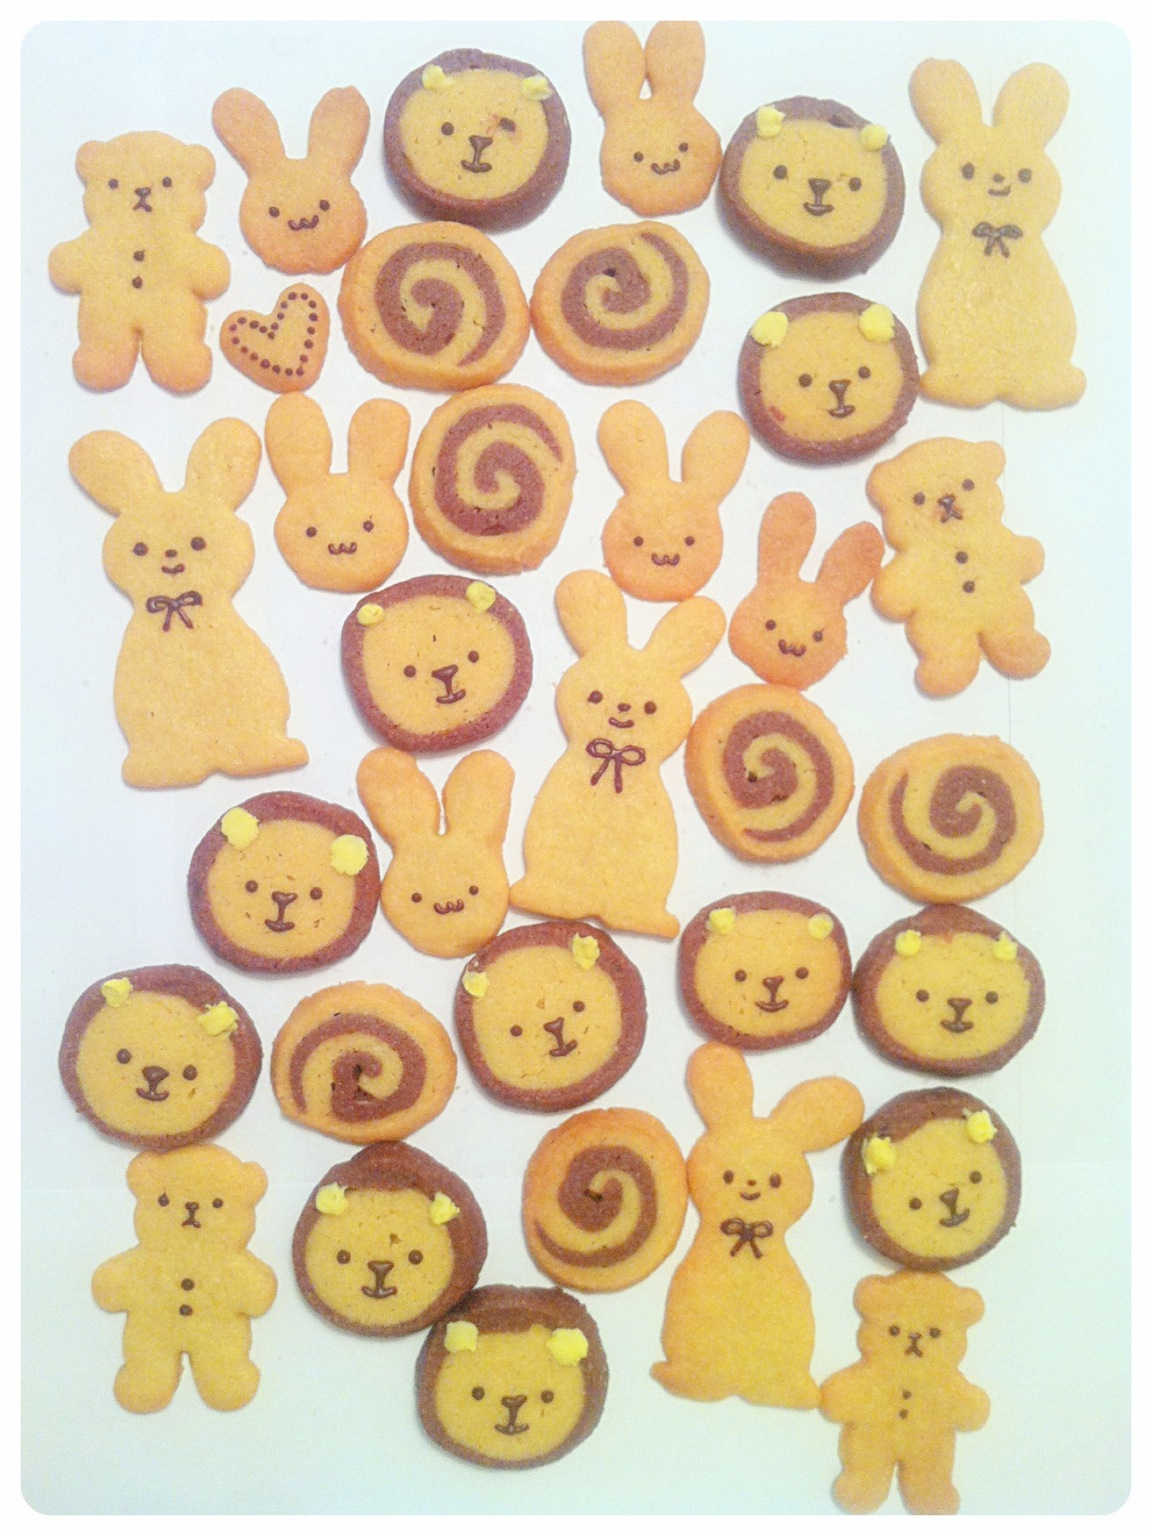 Cute Rabbit, Lion, Bear and Swirl Cookies 2 Cherie Kelly Cake London